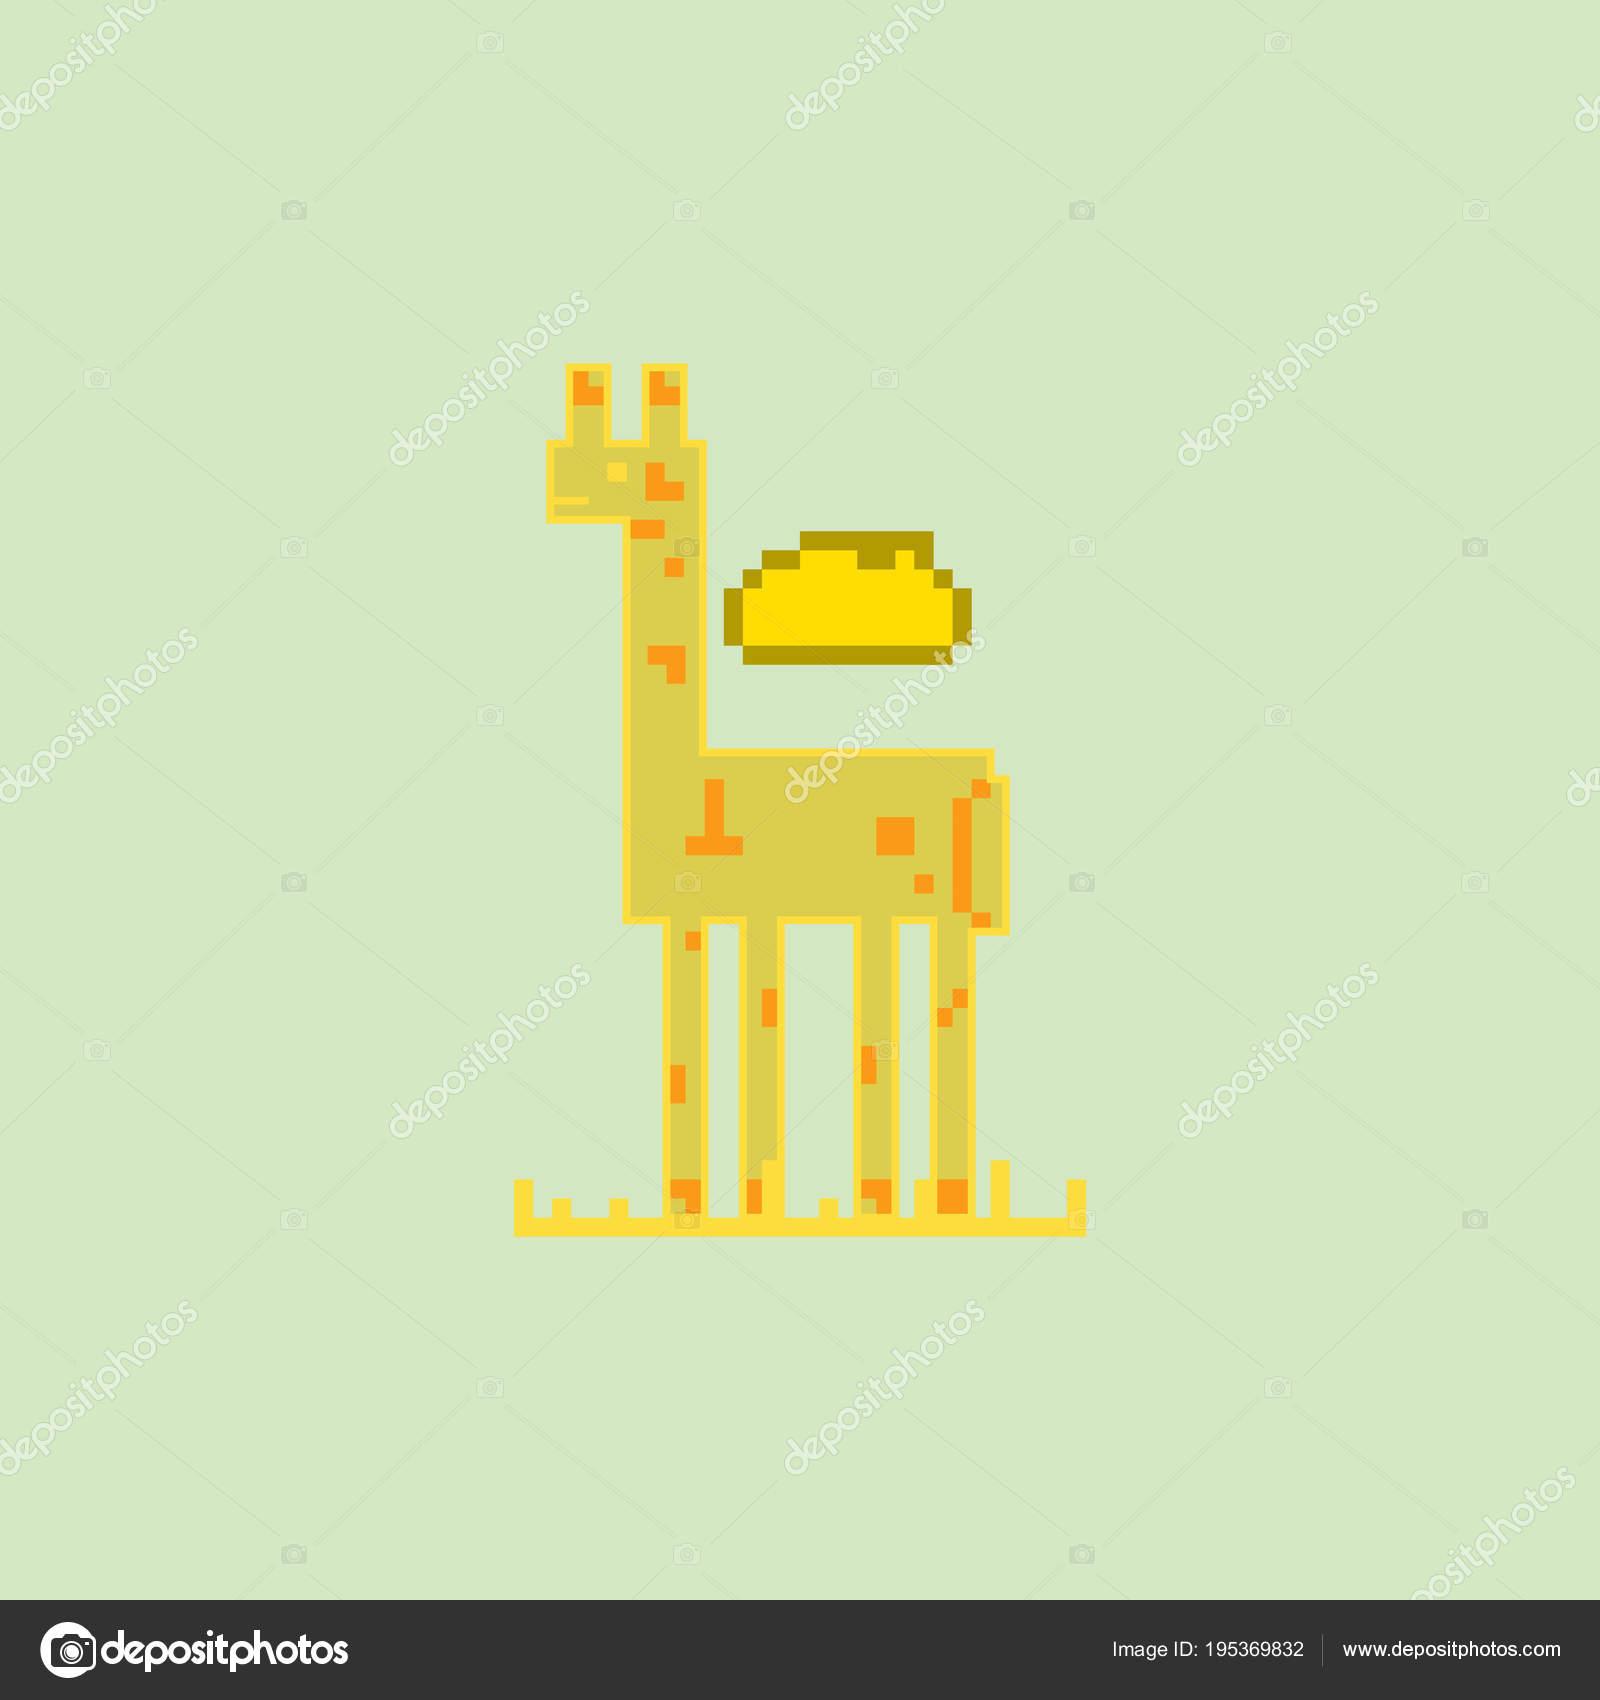 Girafe Mignon Dans Style Simple Pixel Art Image